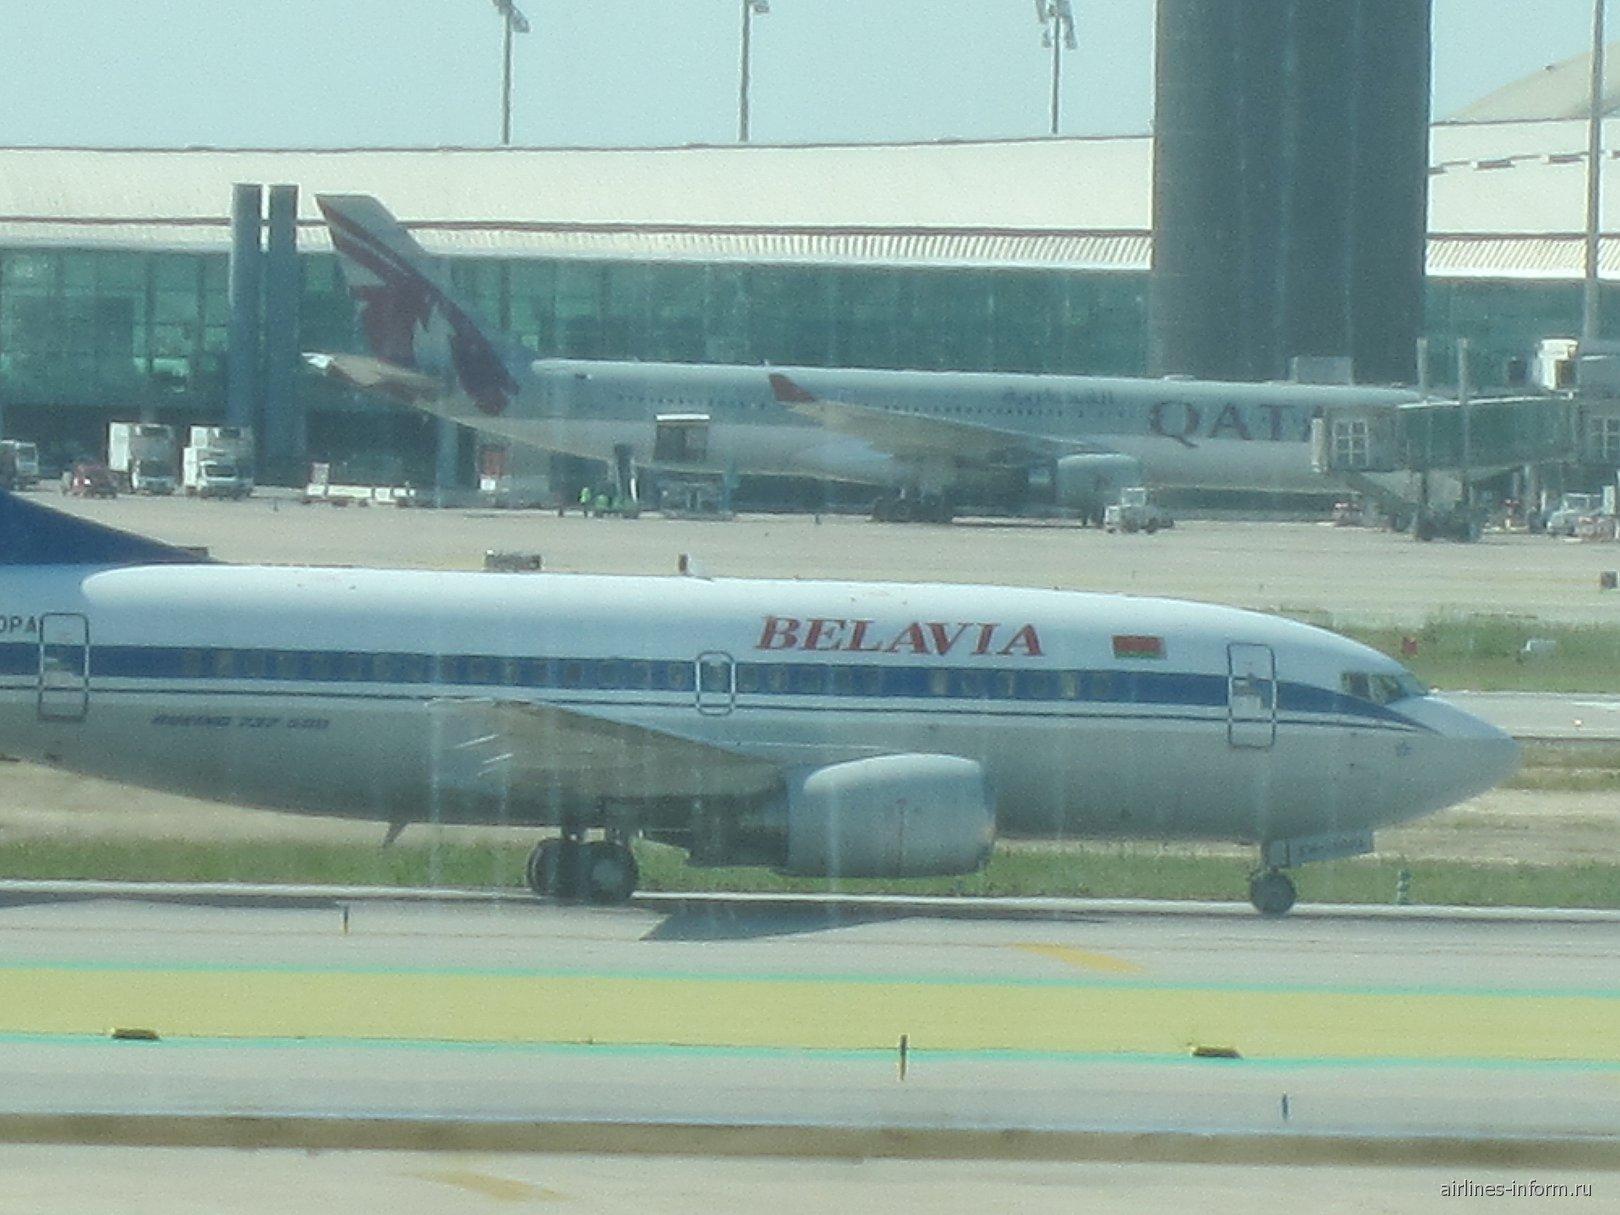 В аэропорту Эль-Прат Барселоны